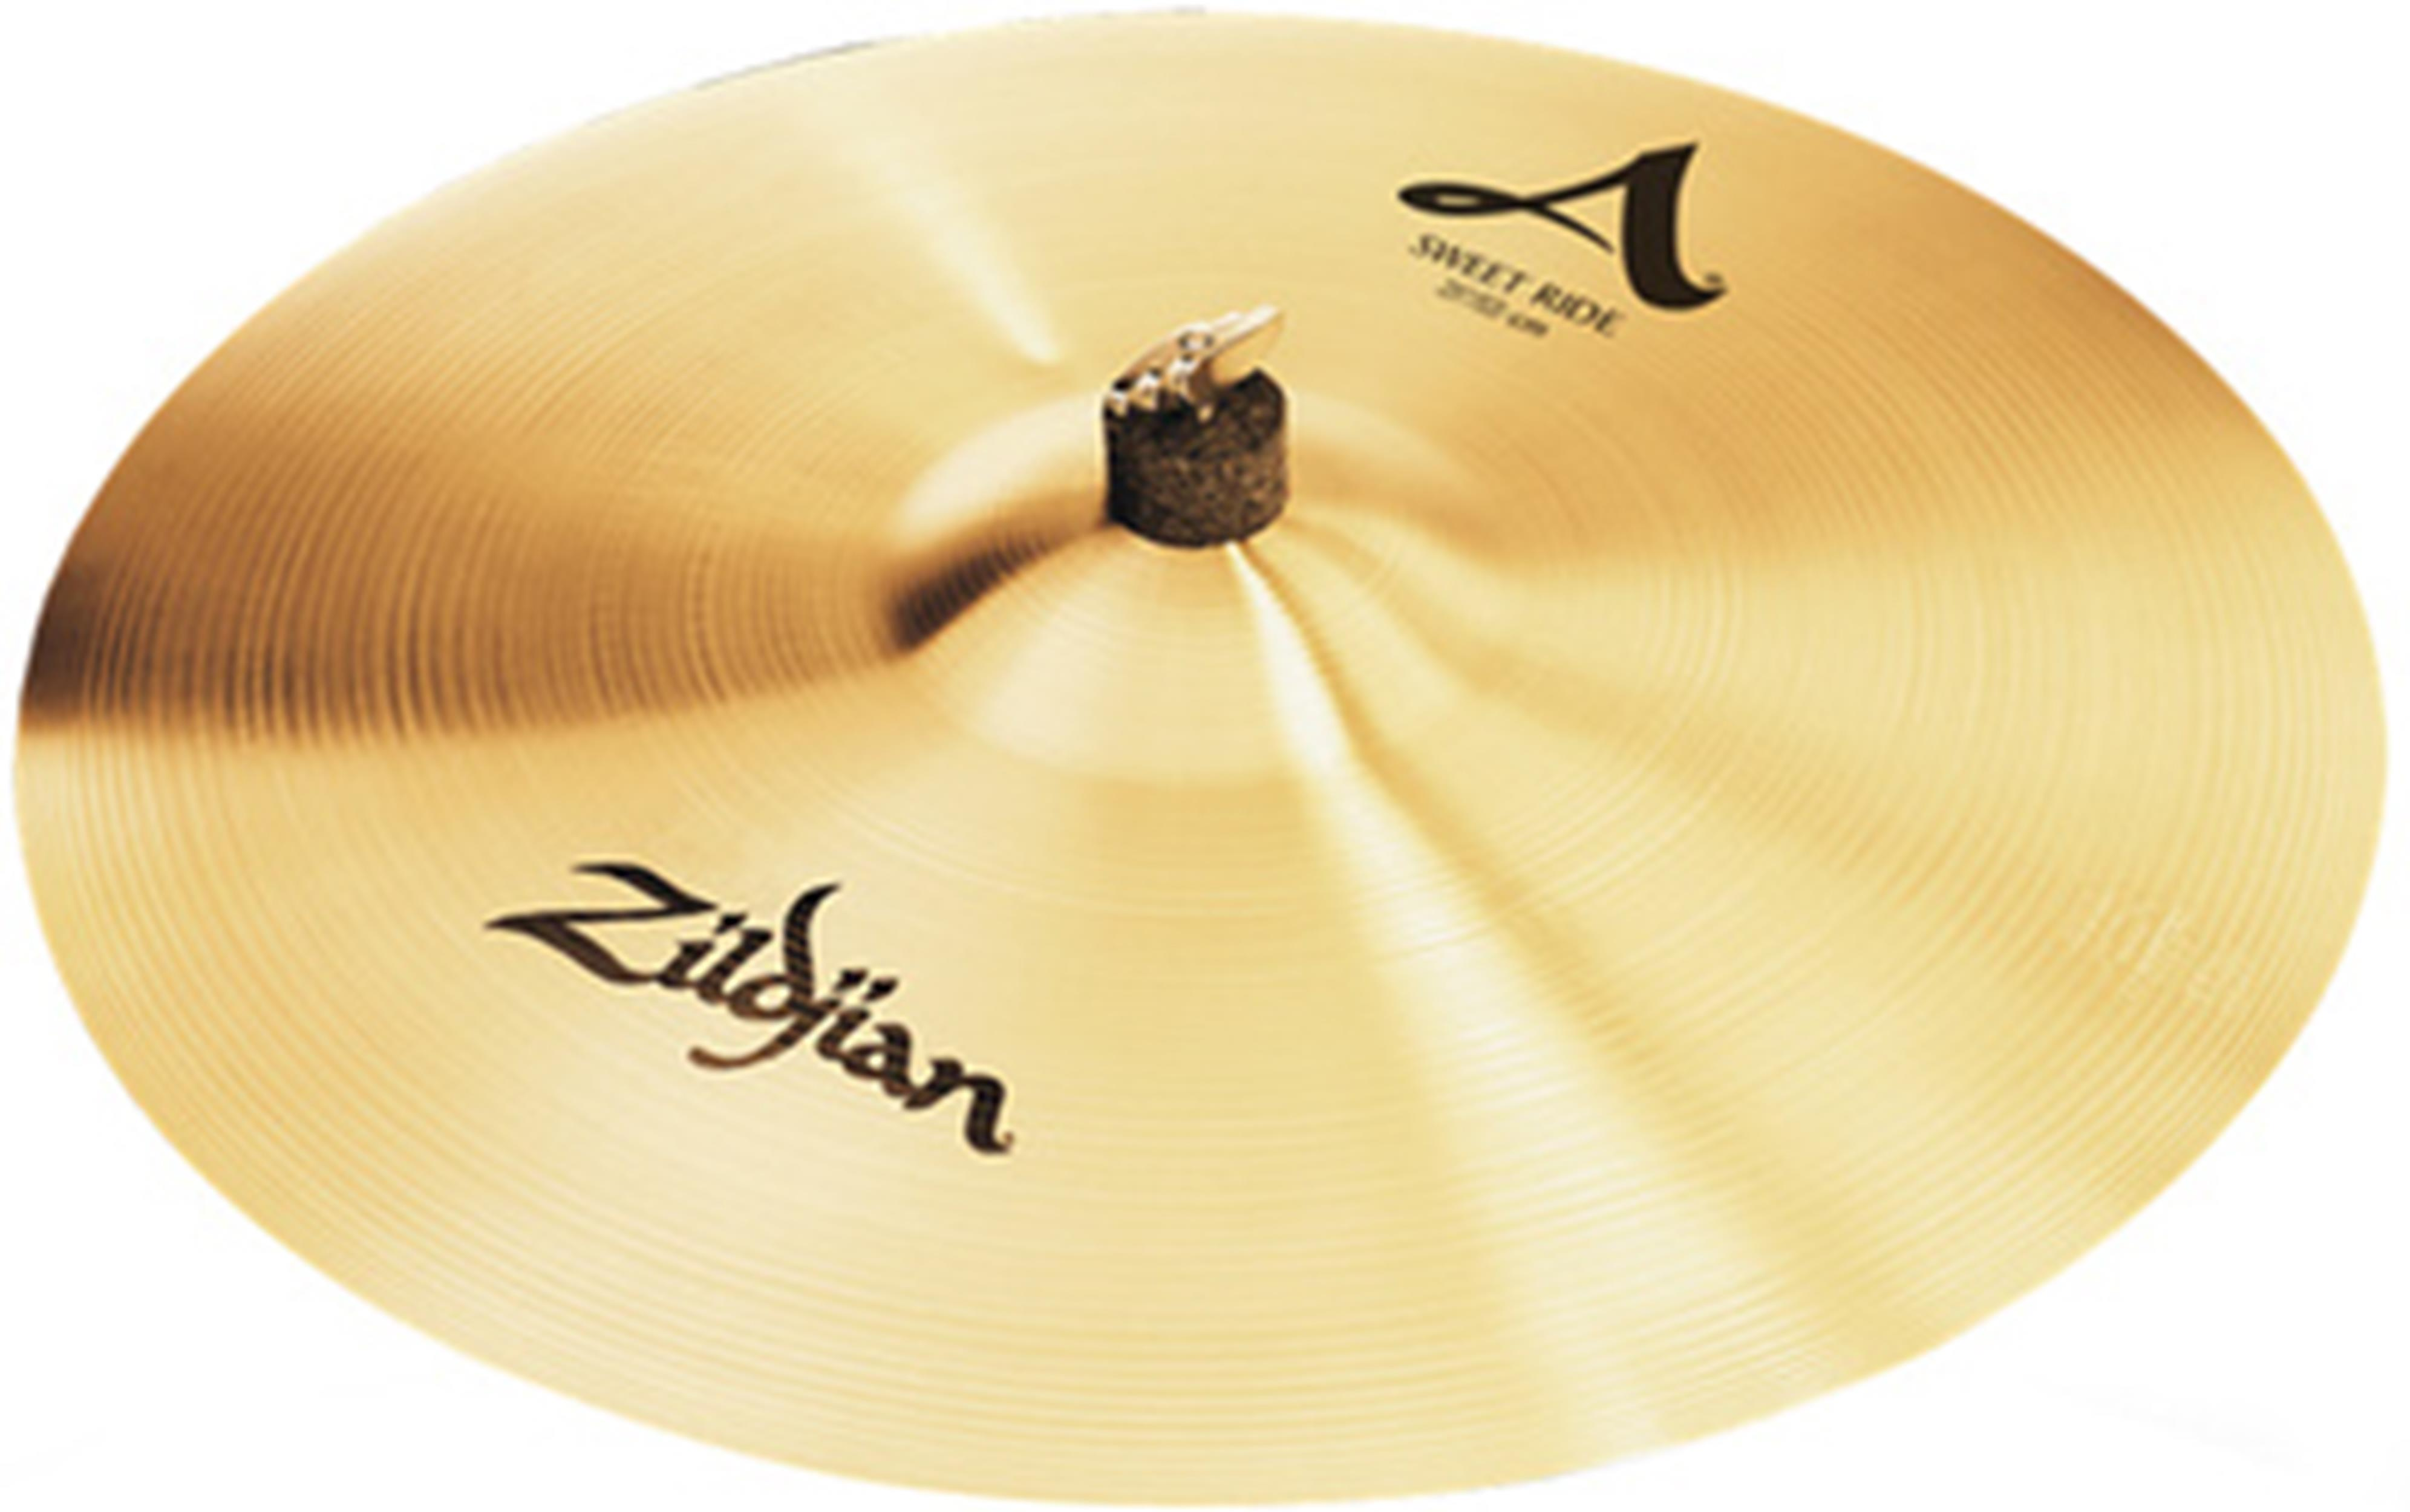 Zildjian-A-series-Avedis-23-Sweet-Ride-cm-58-sku-9022054203159